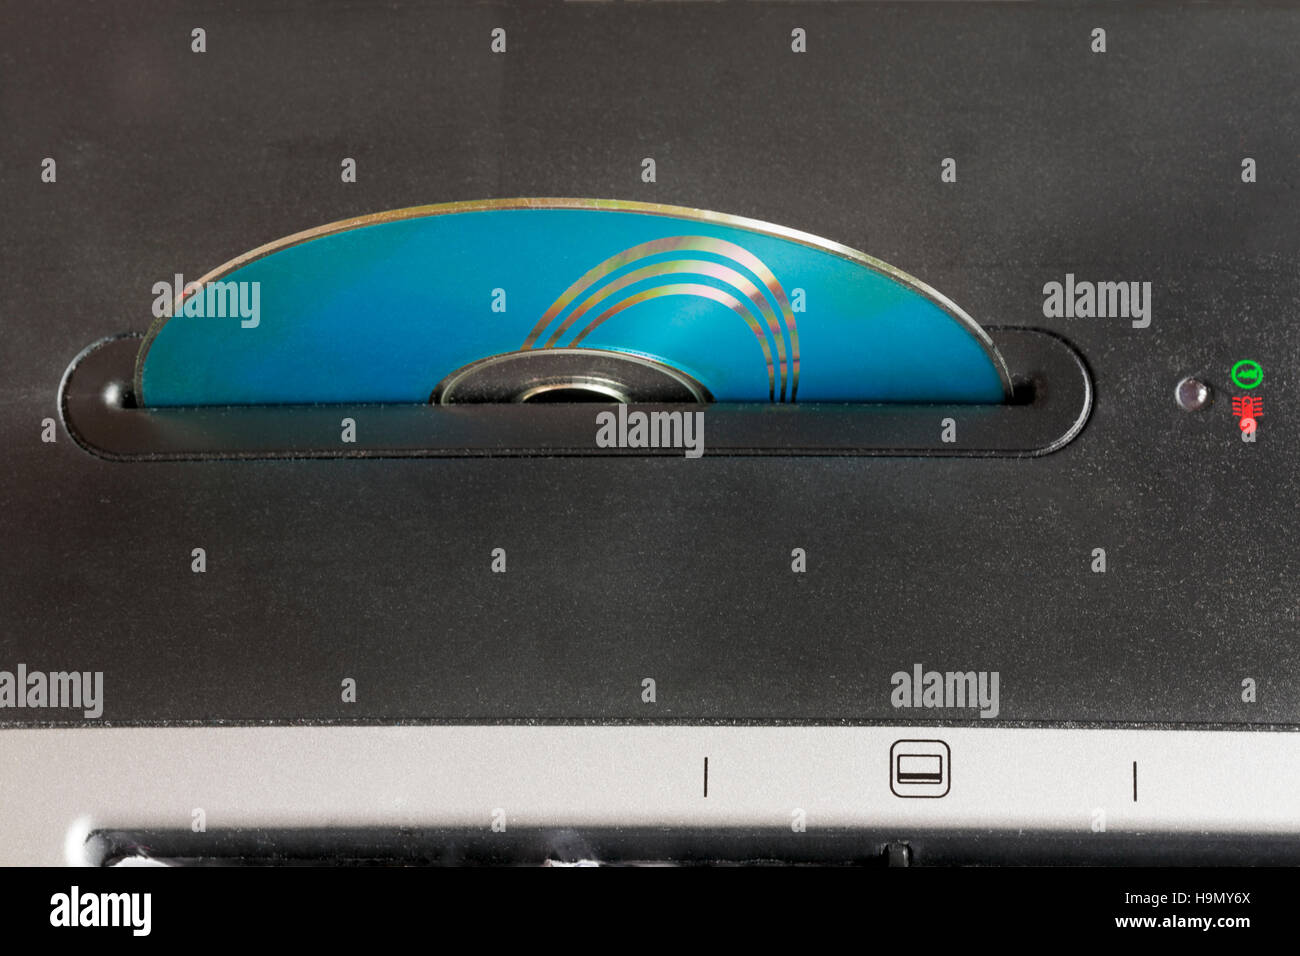 Compact disc inserted in shredder to destroy sensitive information - Stock Image